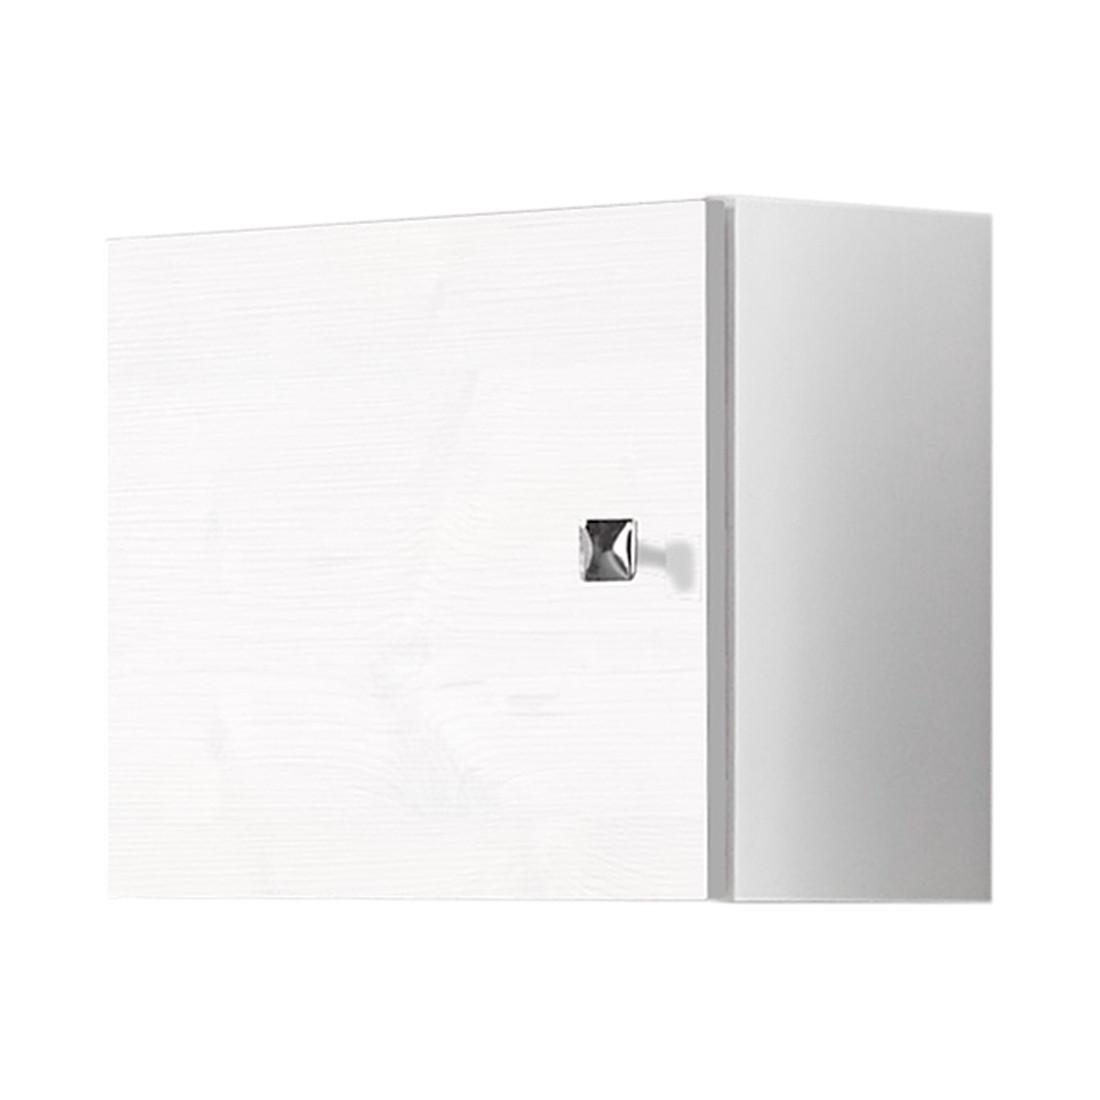 Hangkast Montreal hoogte: 32cm glanzend wit, Schildmeyer